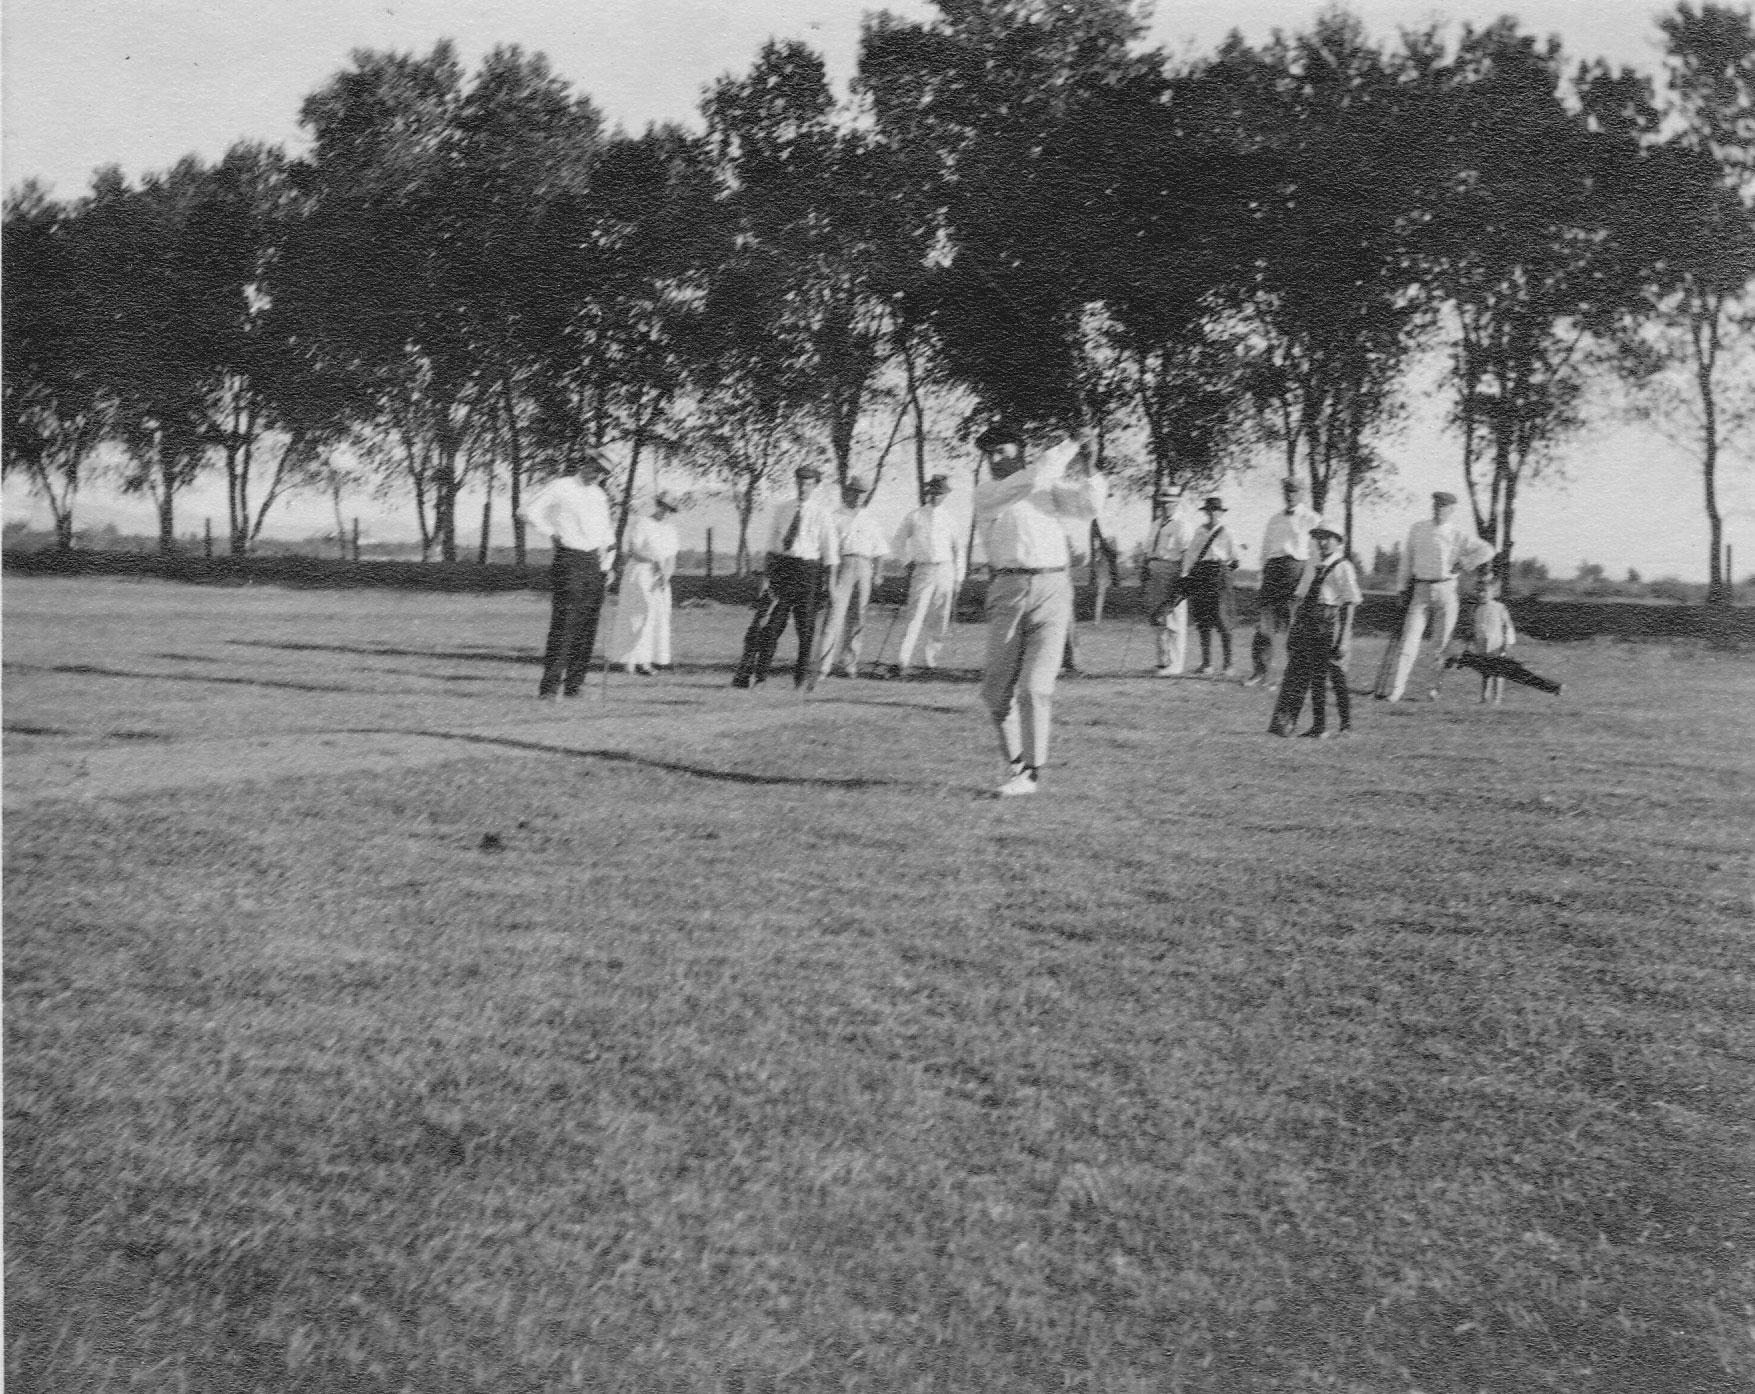 Original San Marcos Hotel Golf Course, 1913